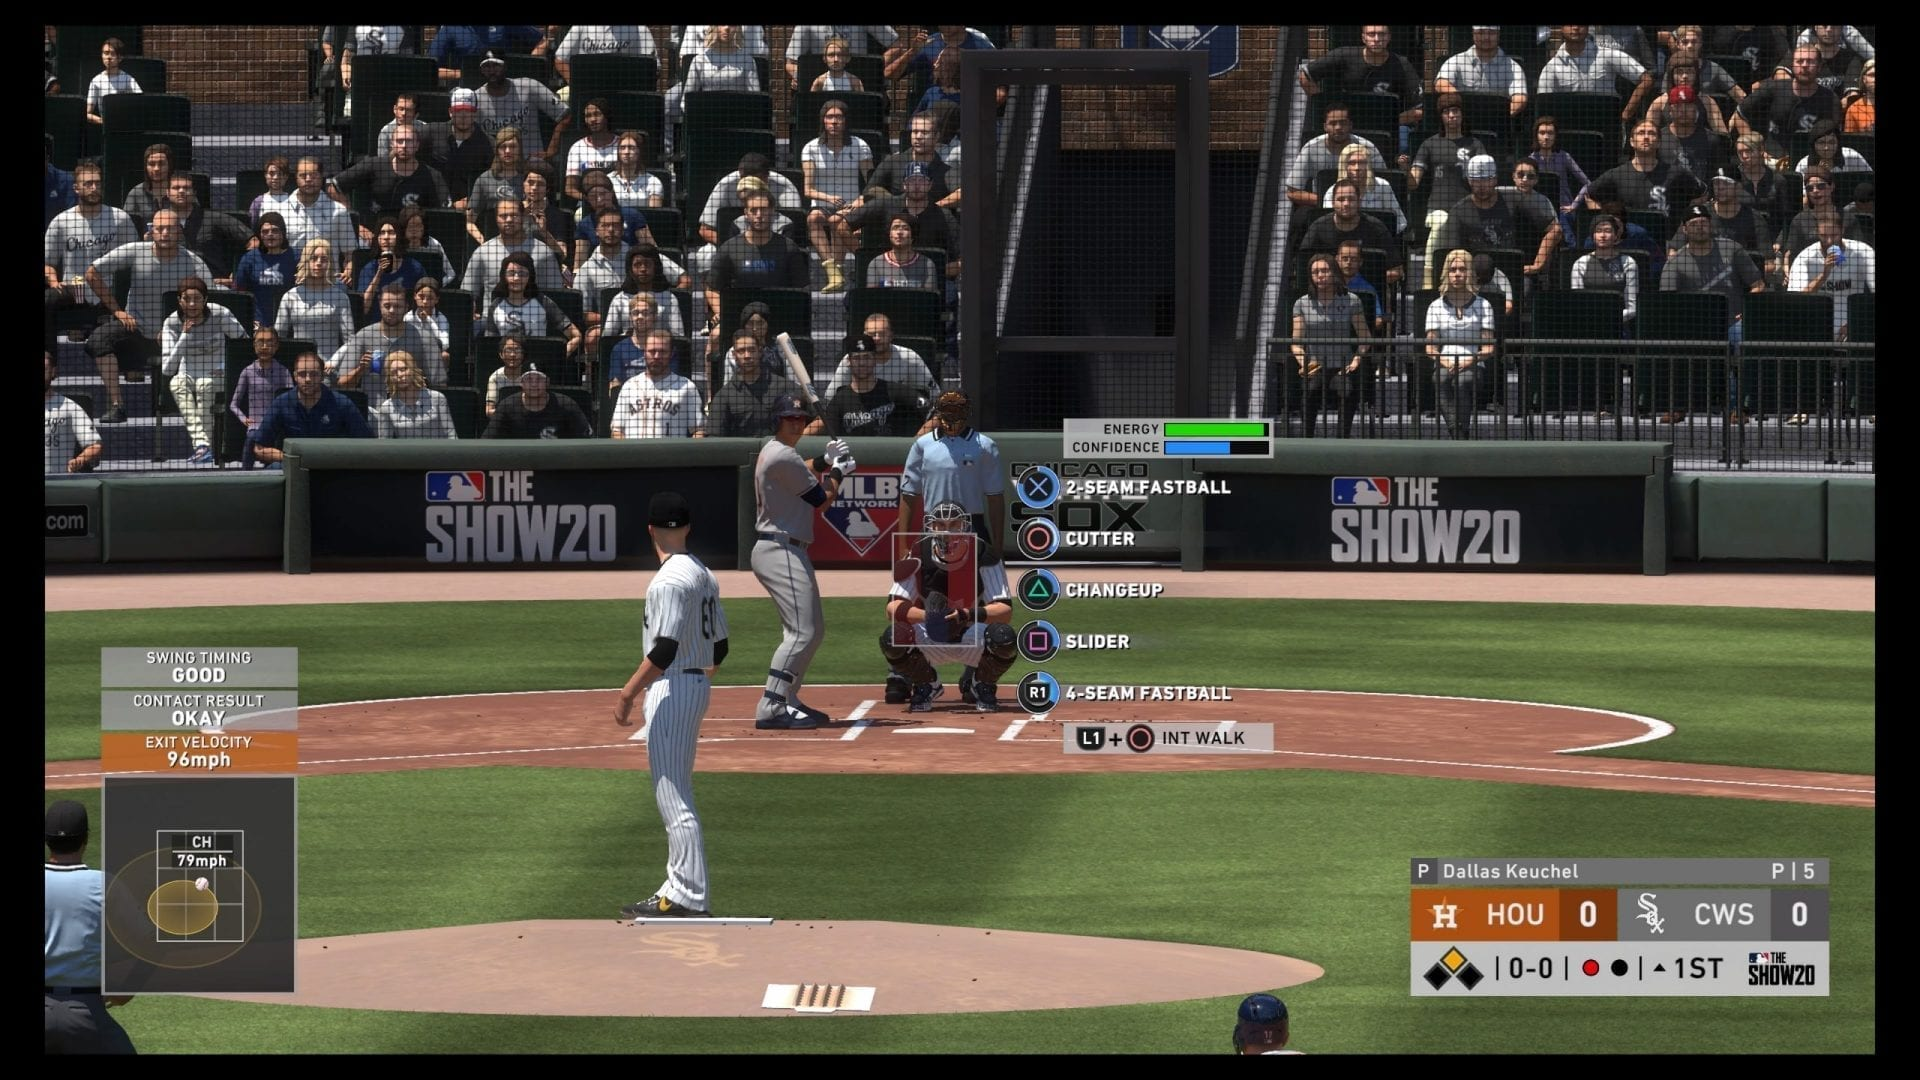 MLB(R) The Show(TM) 20